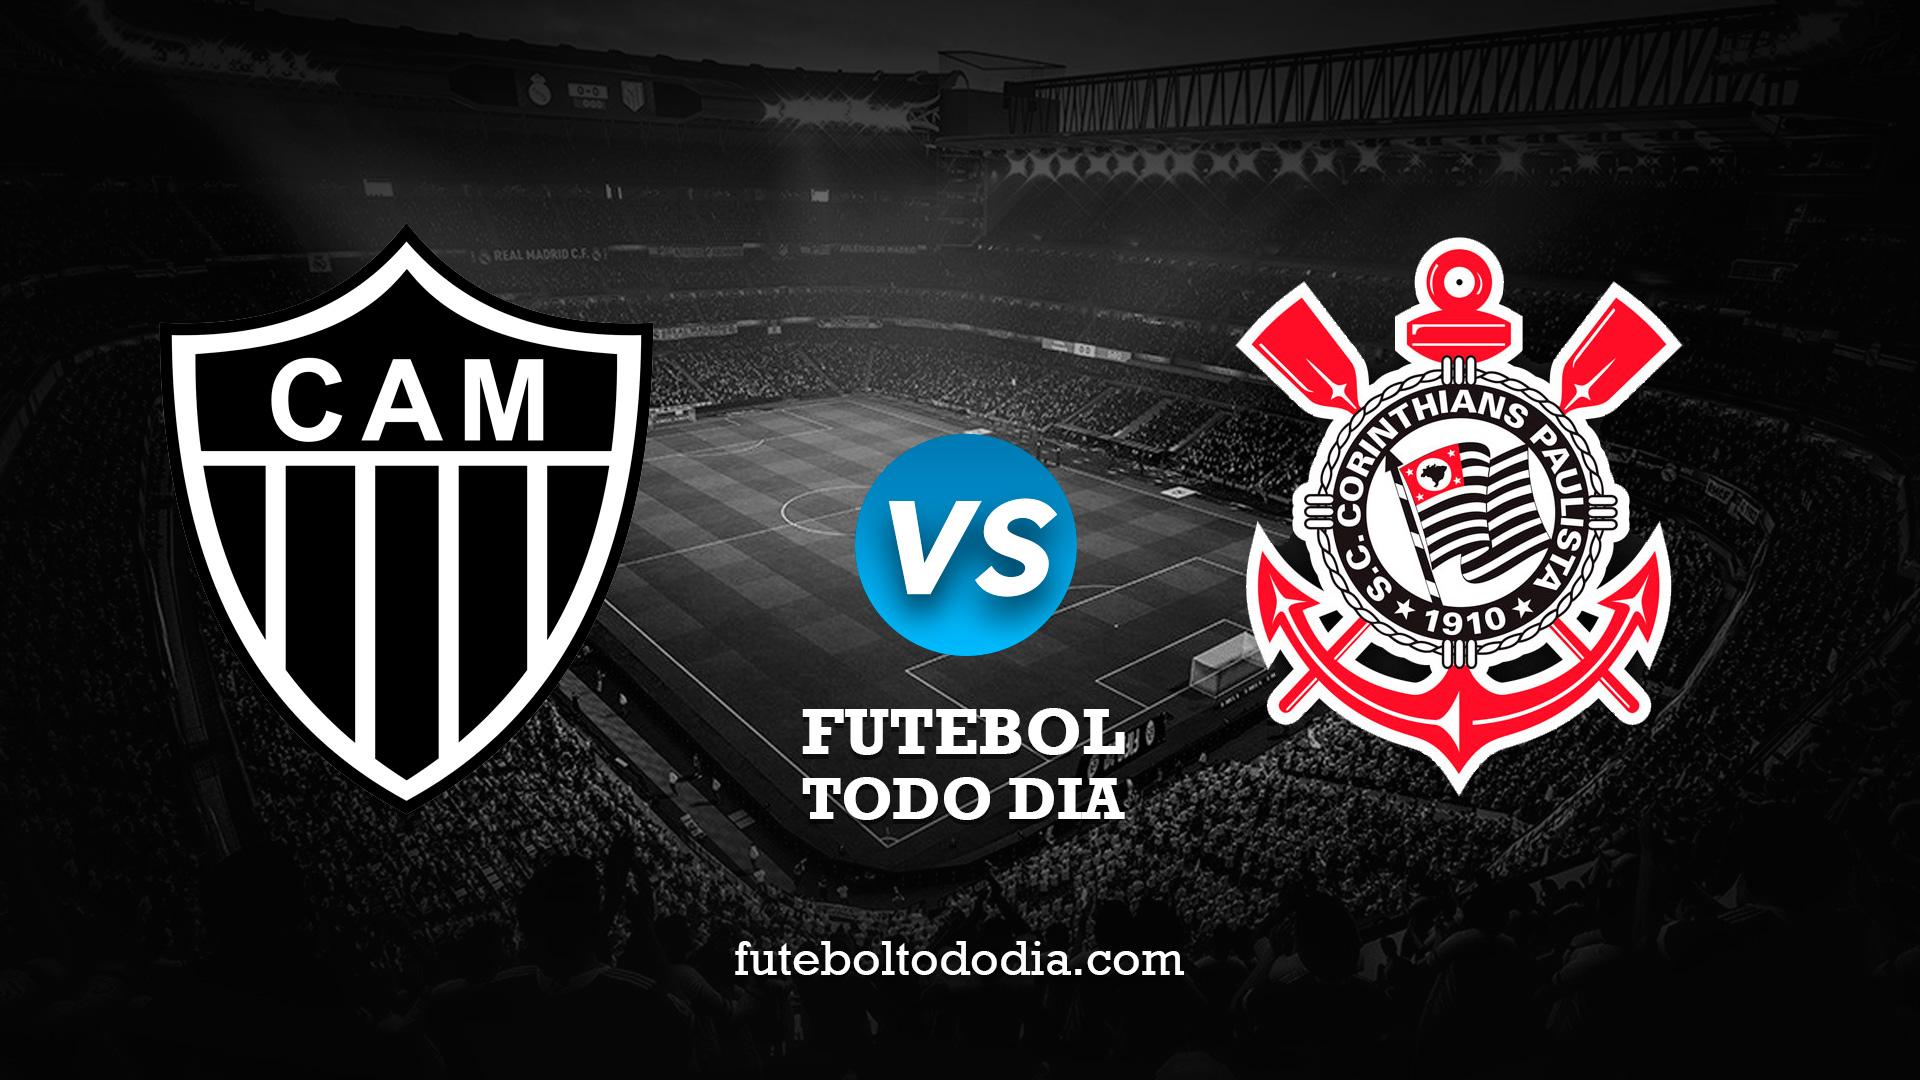 Atlético-MG x Corinthians Ao Vivo